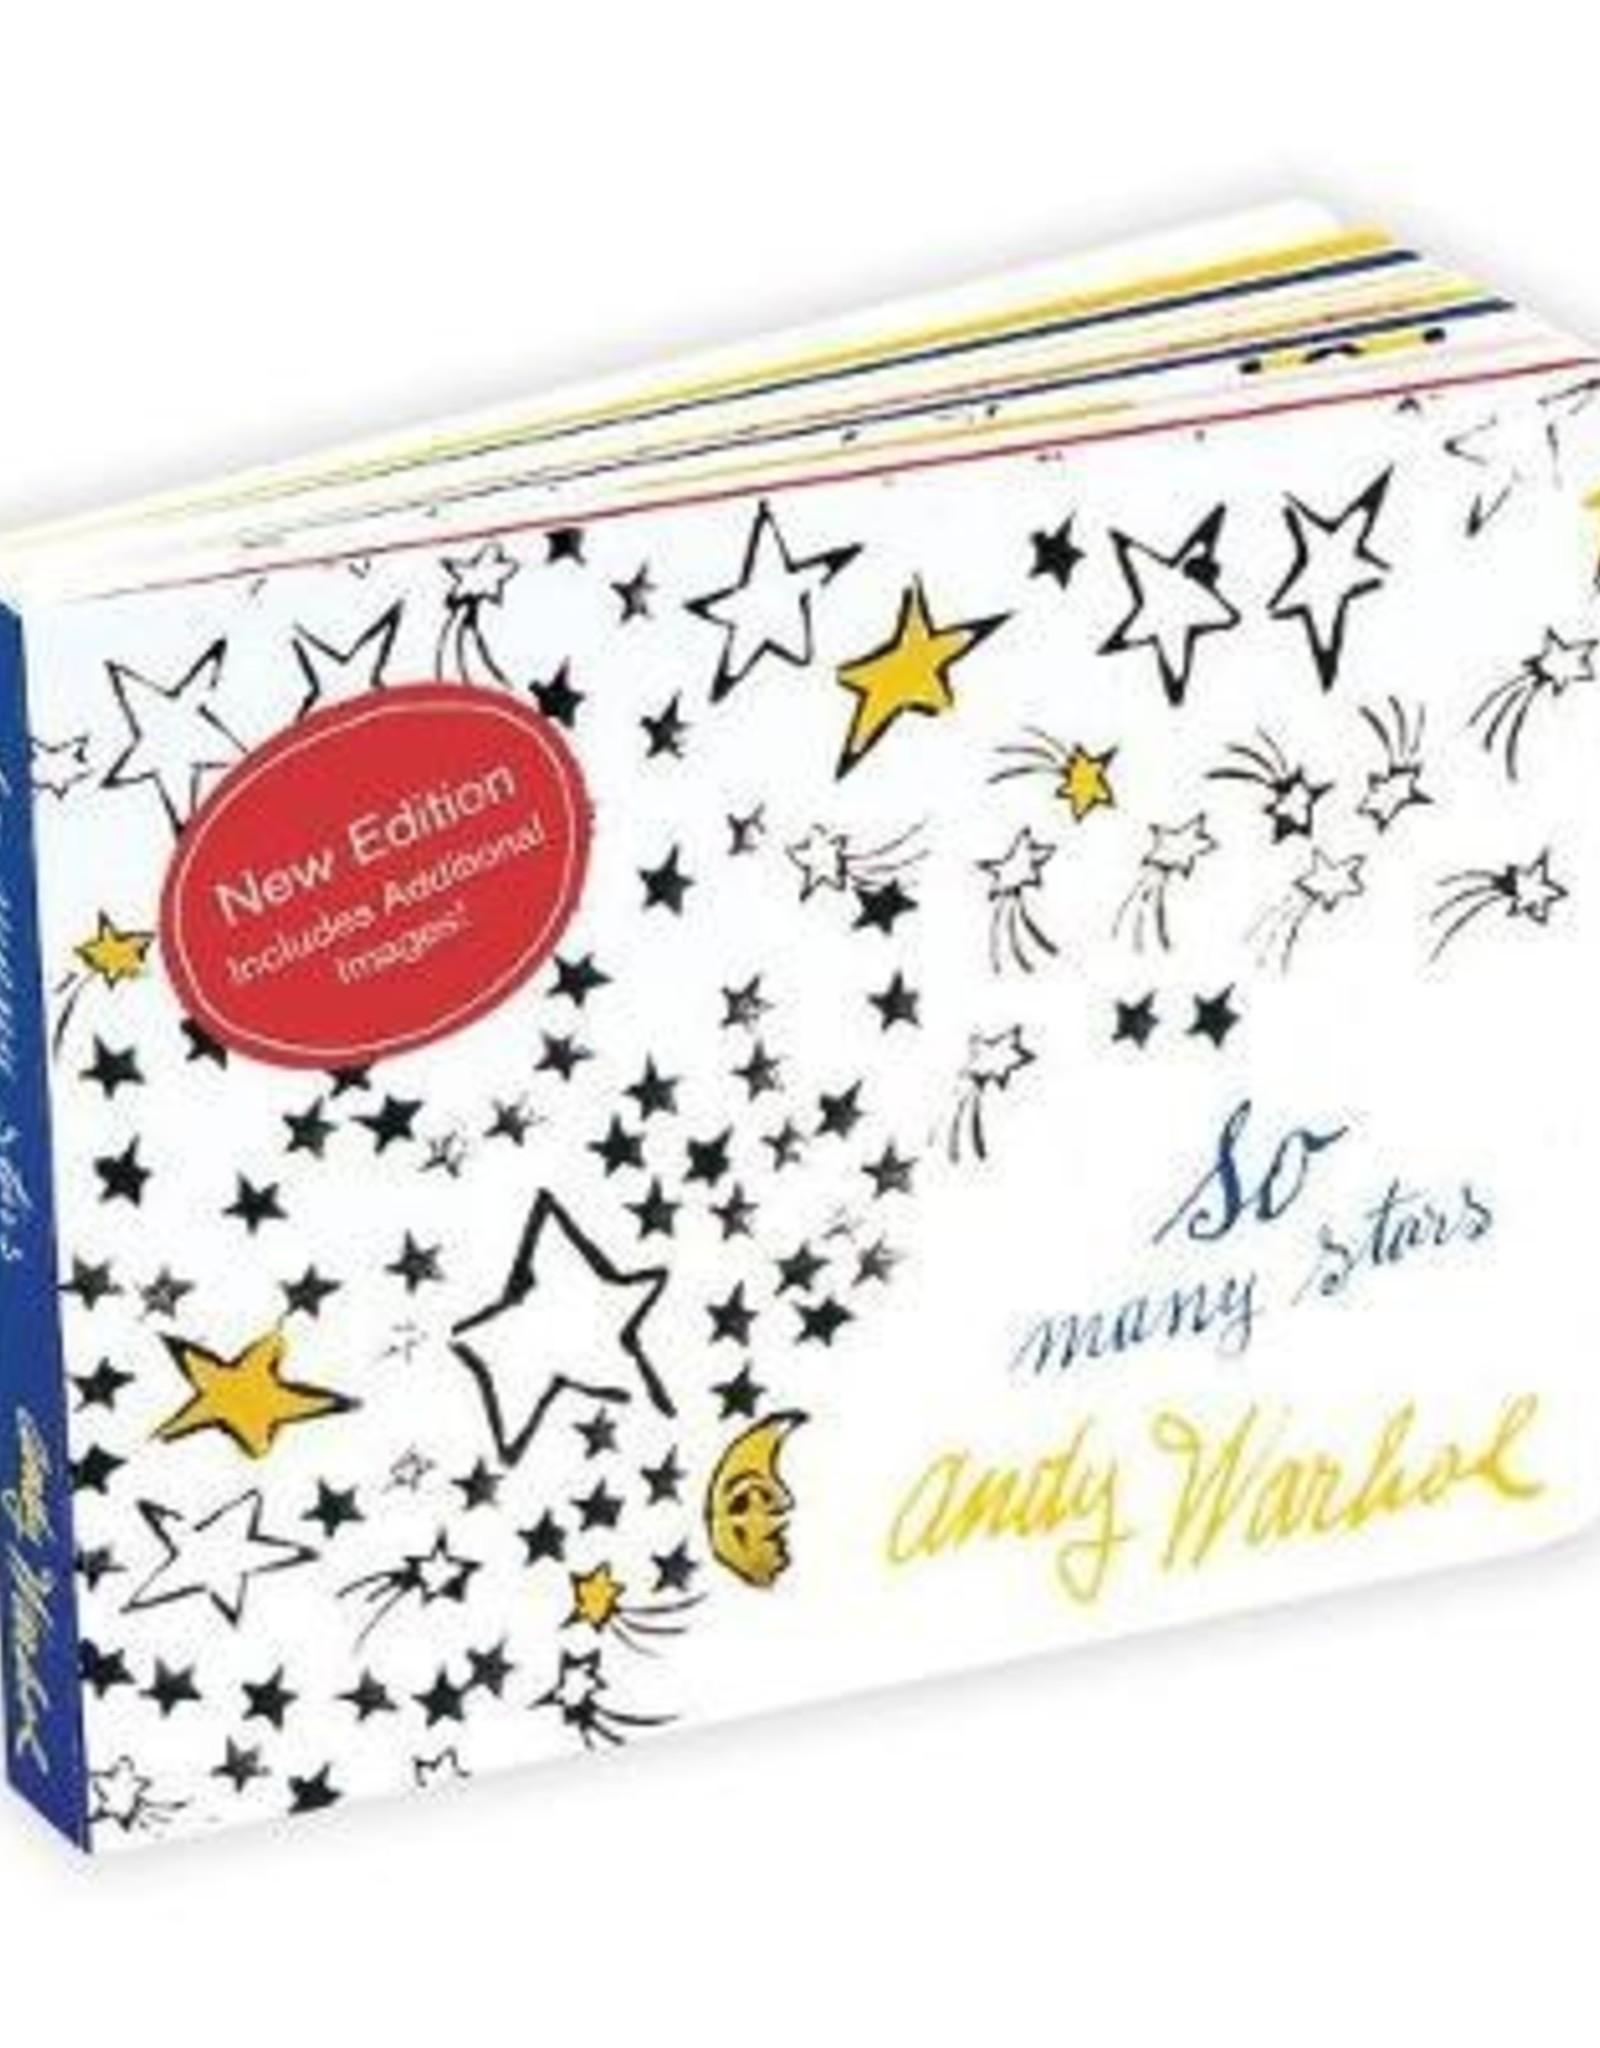 Argosy So Many Stars - Andy Warhol